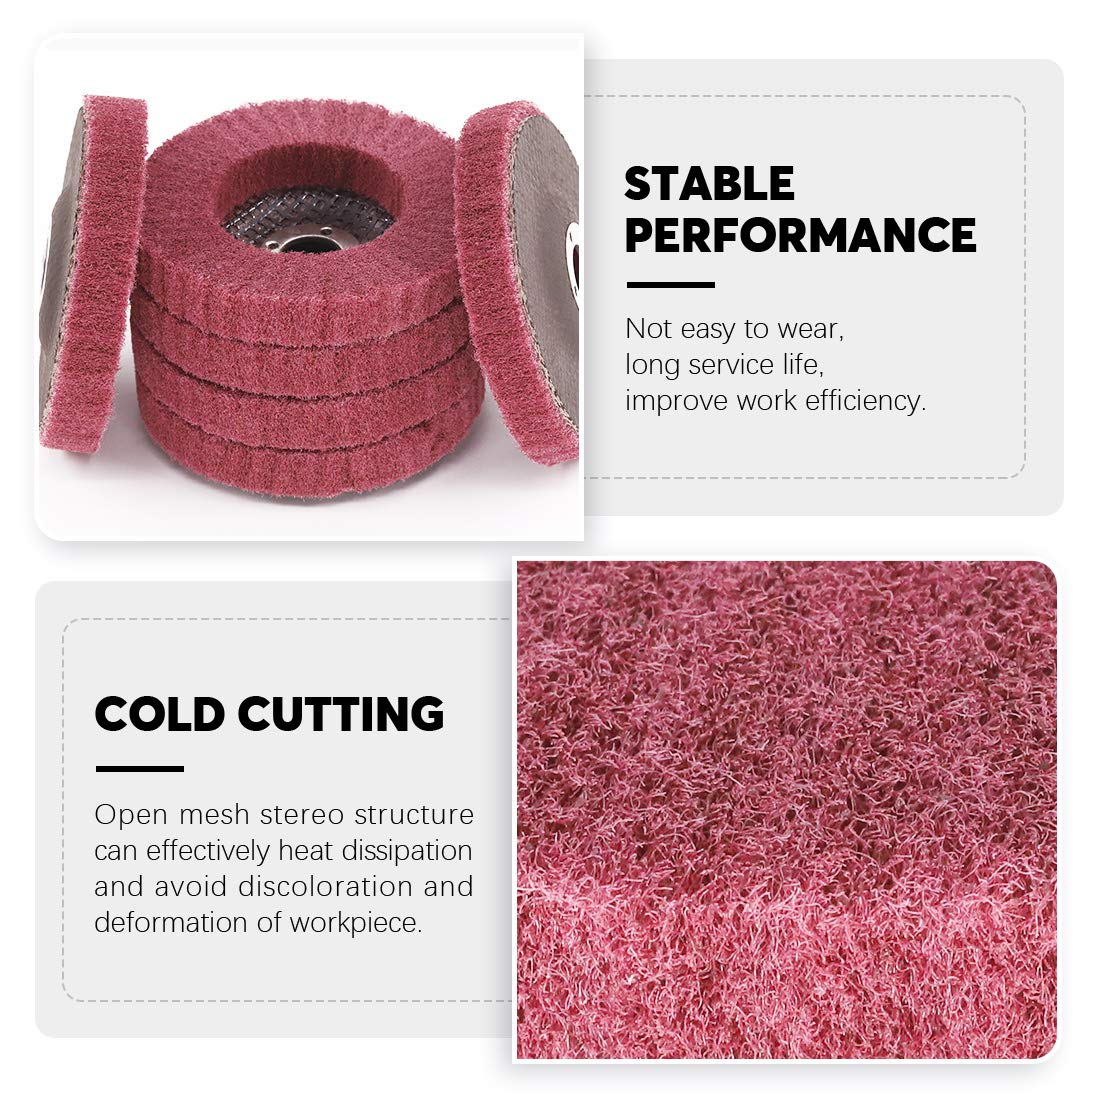 Rustark 6 Pcs 4Nylon Fiber Flap Disc Abrasive Flap Wheel Scouring Pad Grinding Wheels for Angle Grinder 240 Grit Nylon Polishing Discs for Marble Wood Metal Sanding Buffing Pads